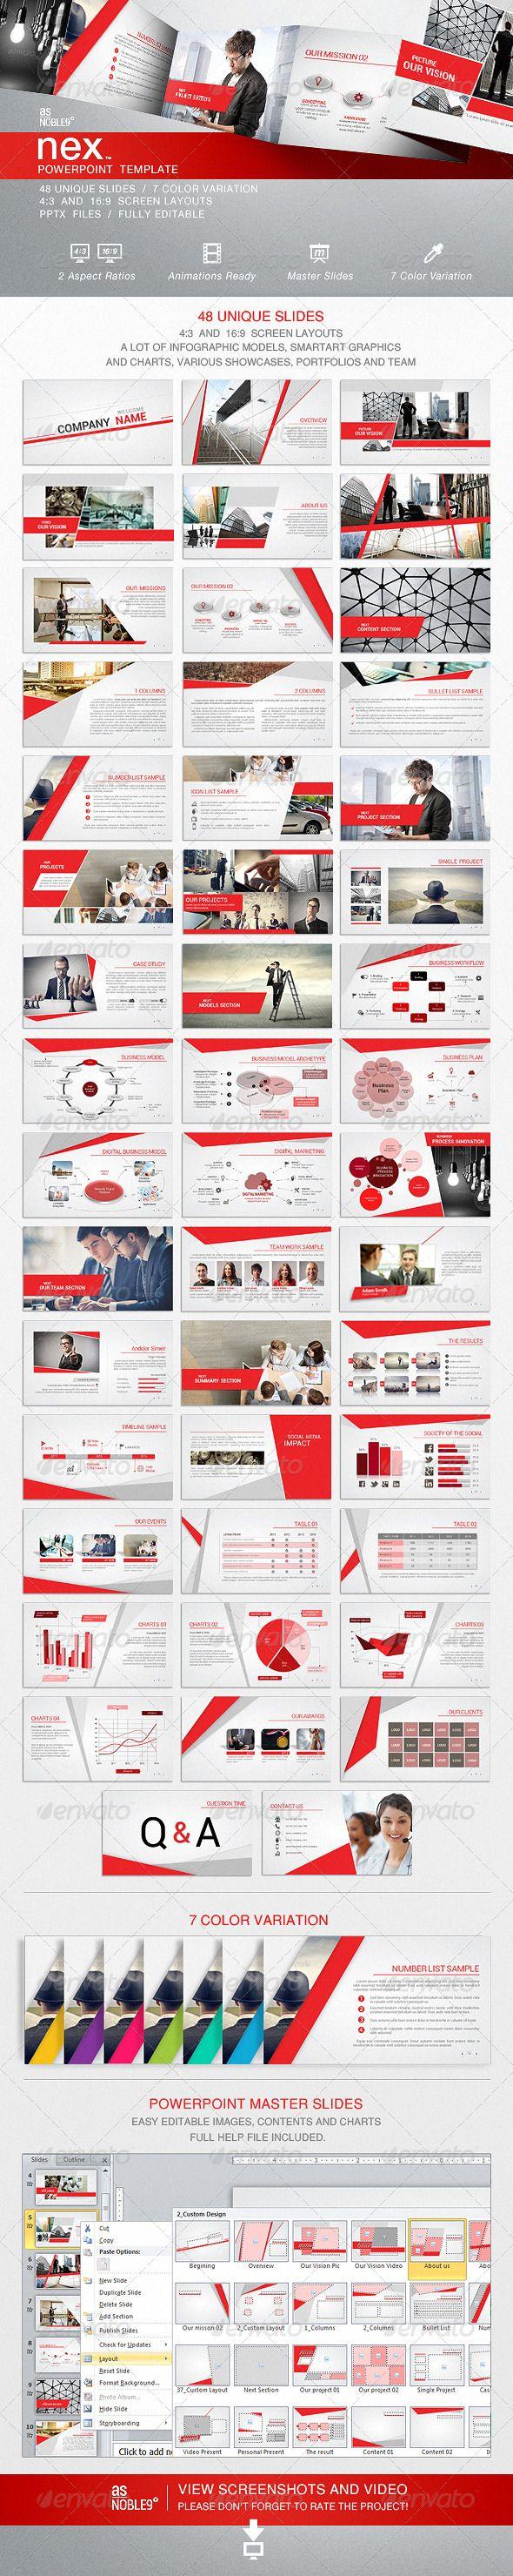 NEX - PowerPoint Template - Business Powerpoint Templates